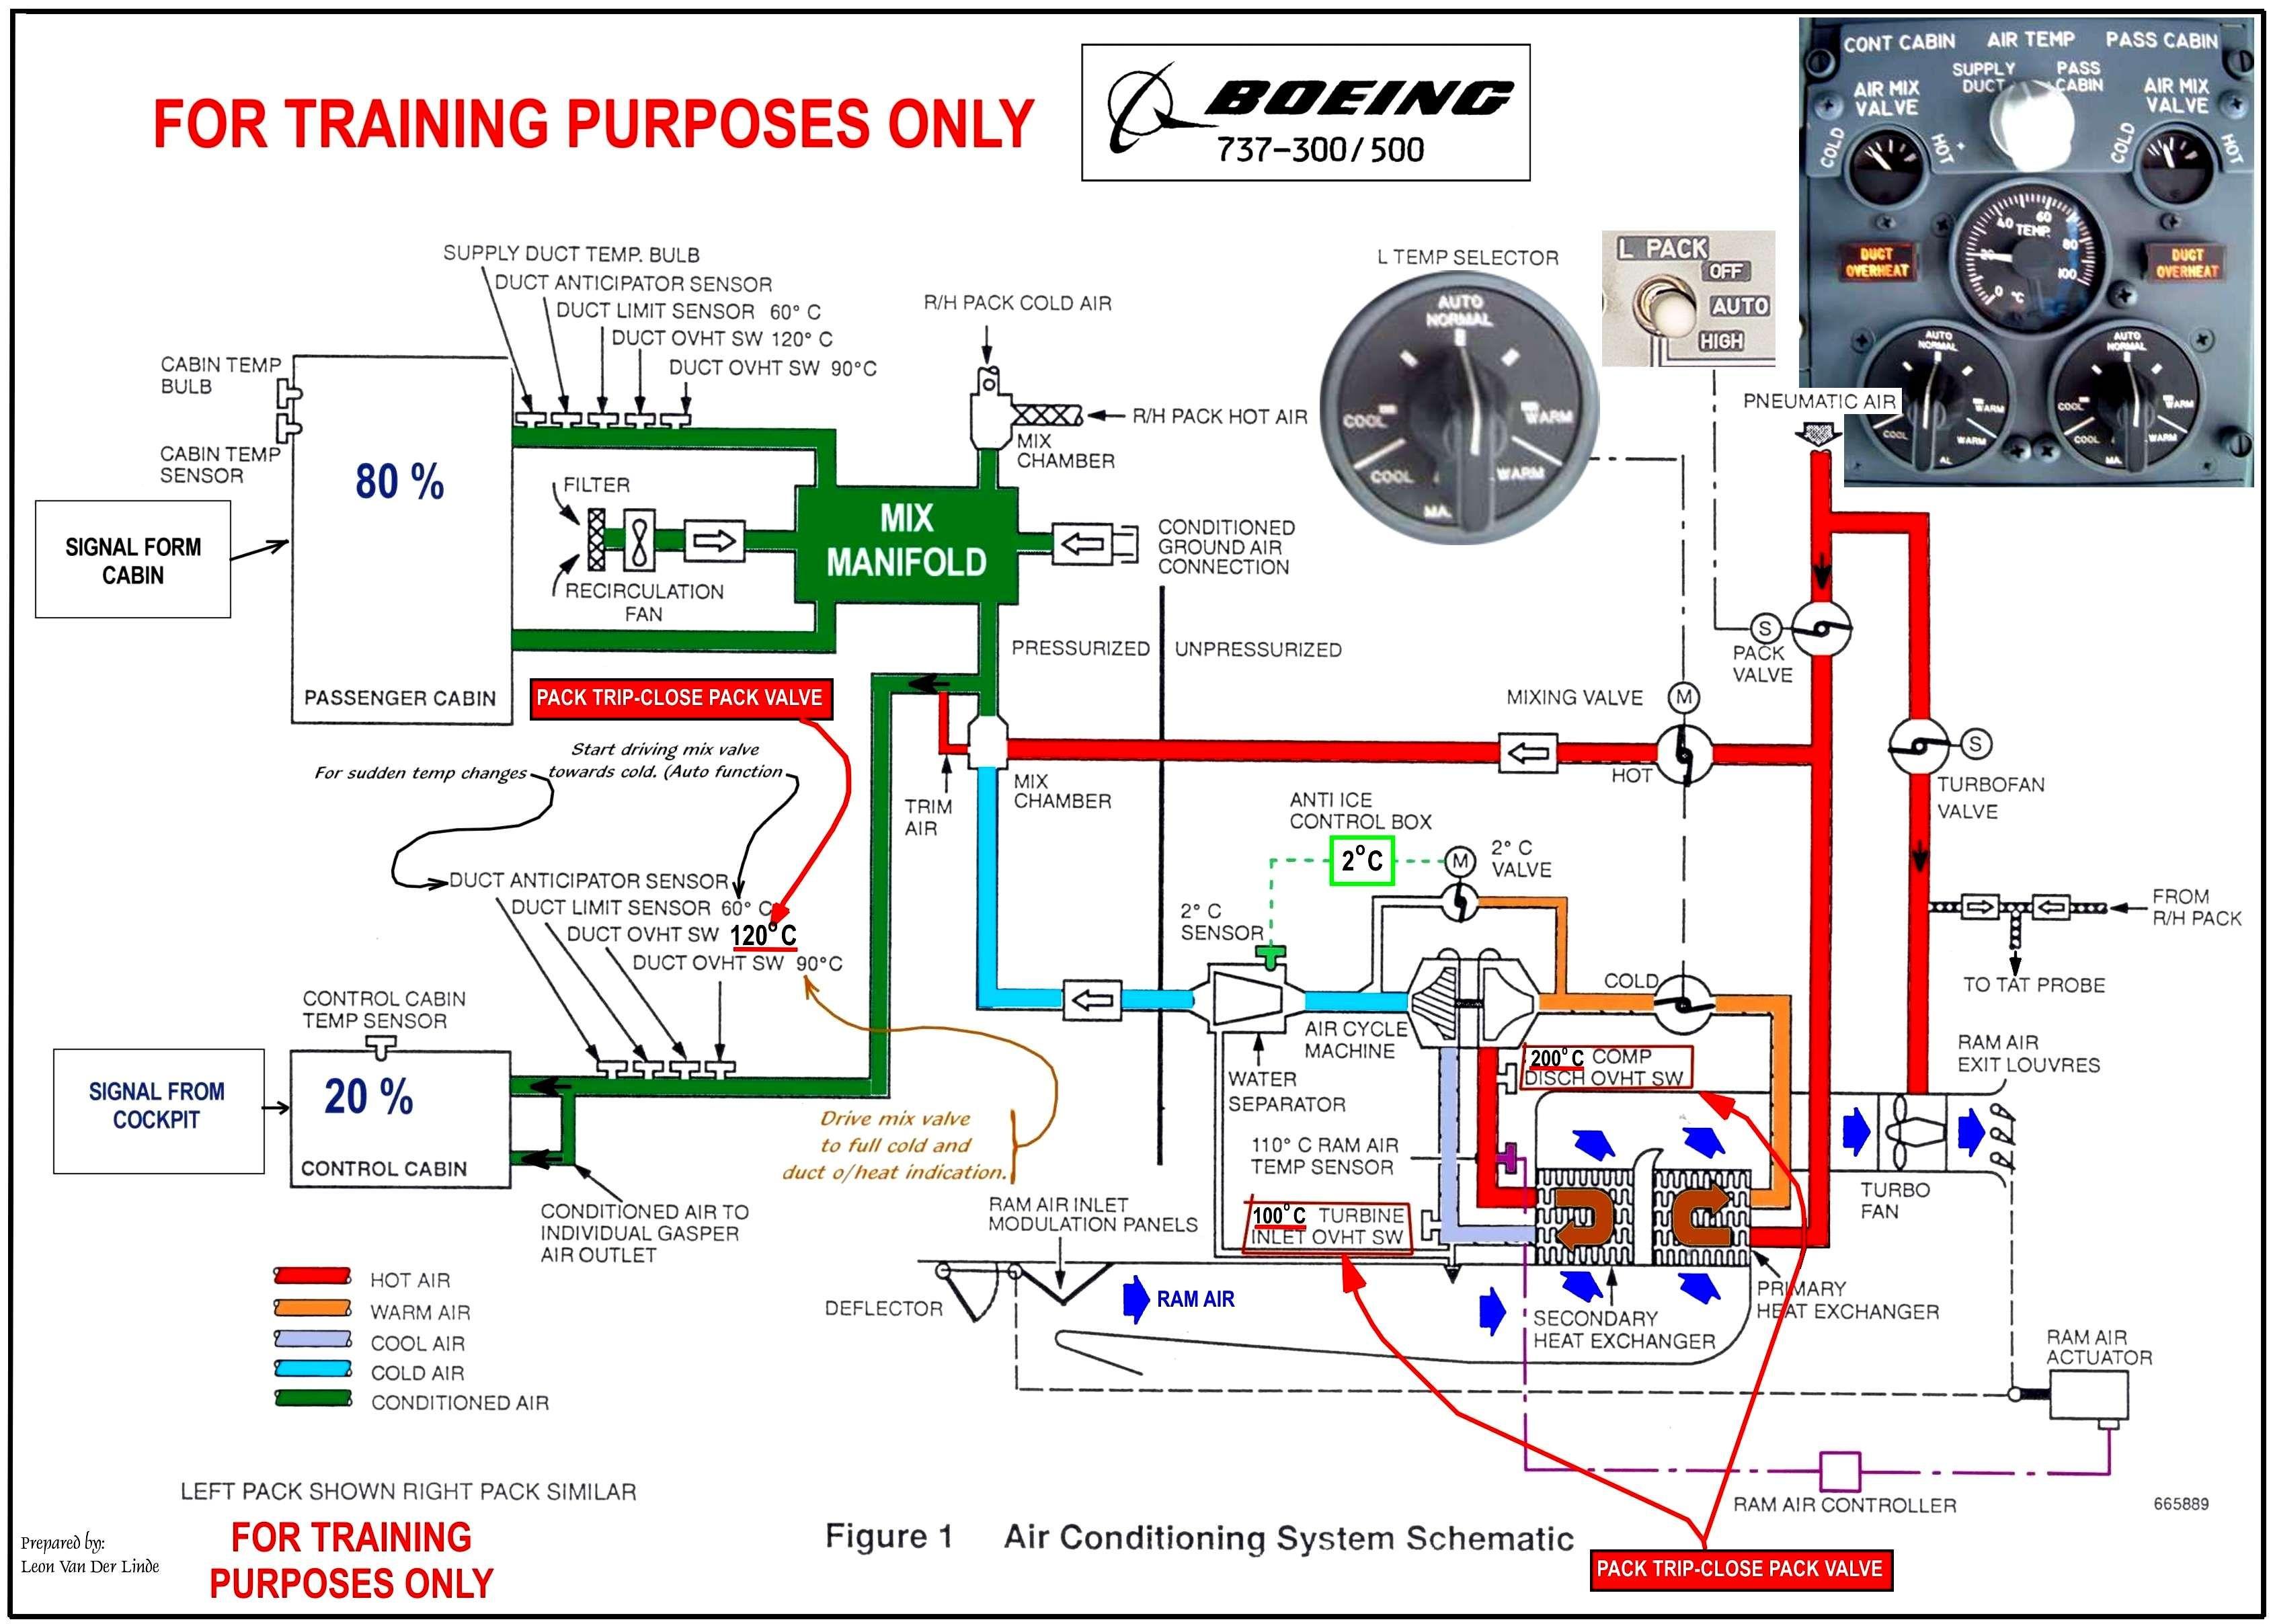 7373/500 Air conditioning schematic